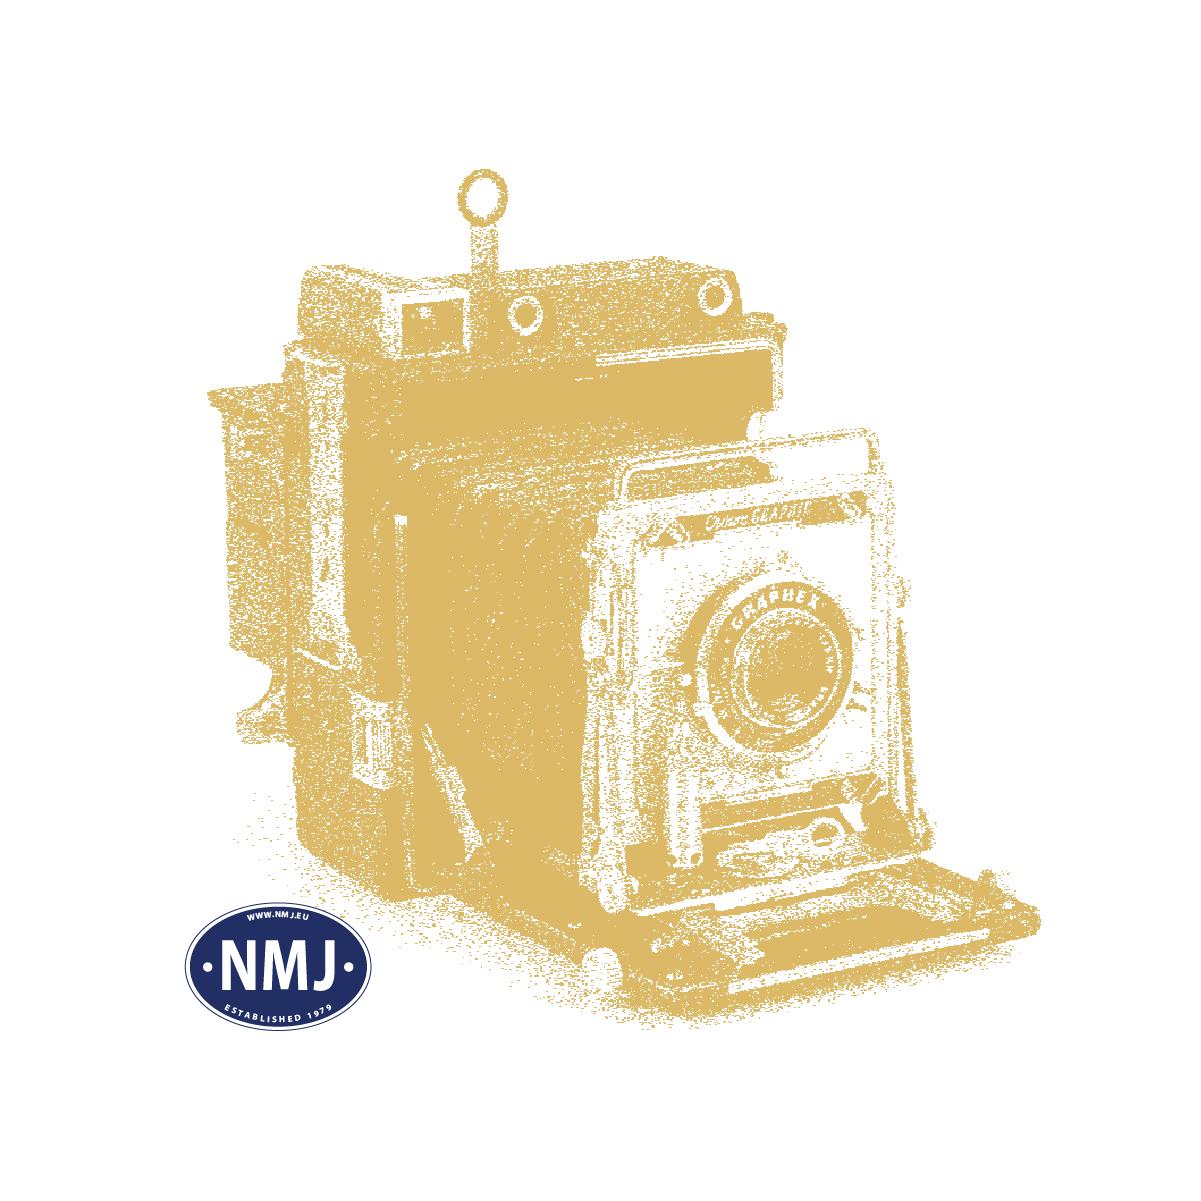 MBR55-1010 - Gressmatte #10, 30 x 40 Cm